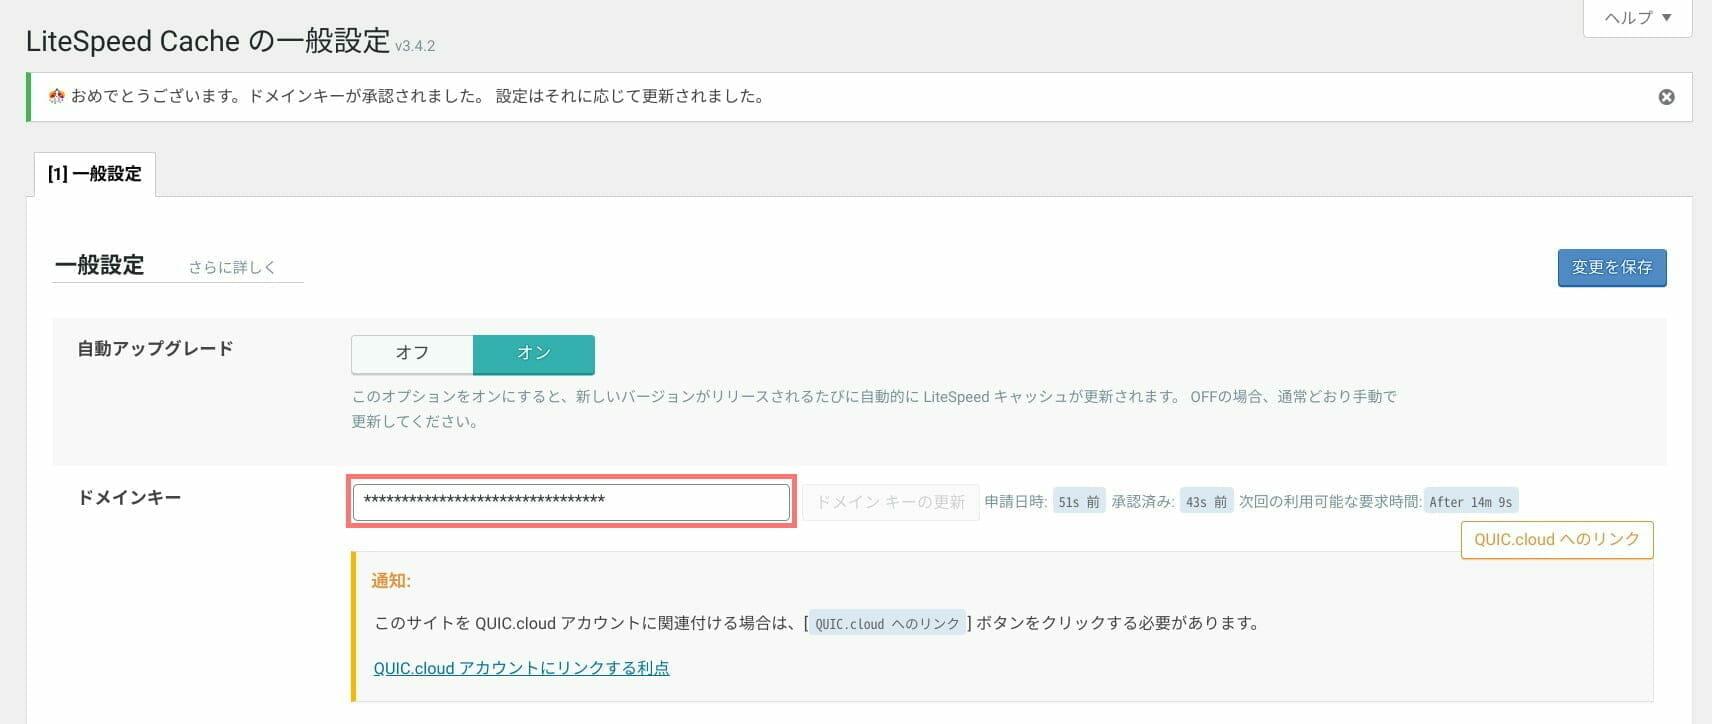 LiteSpeed cache:ドメインキーの取得完了